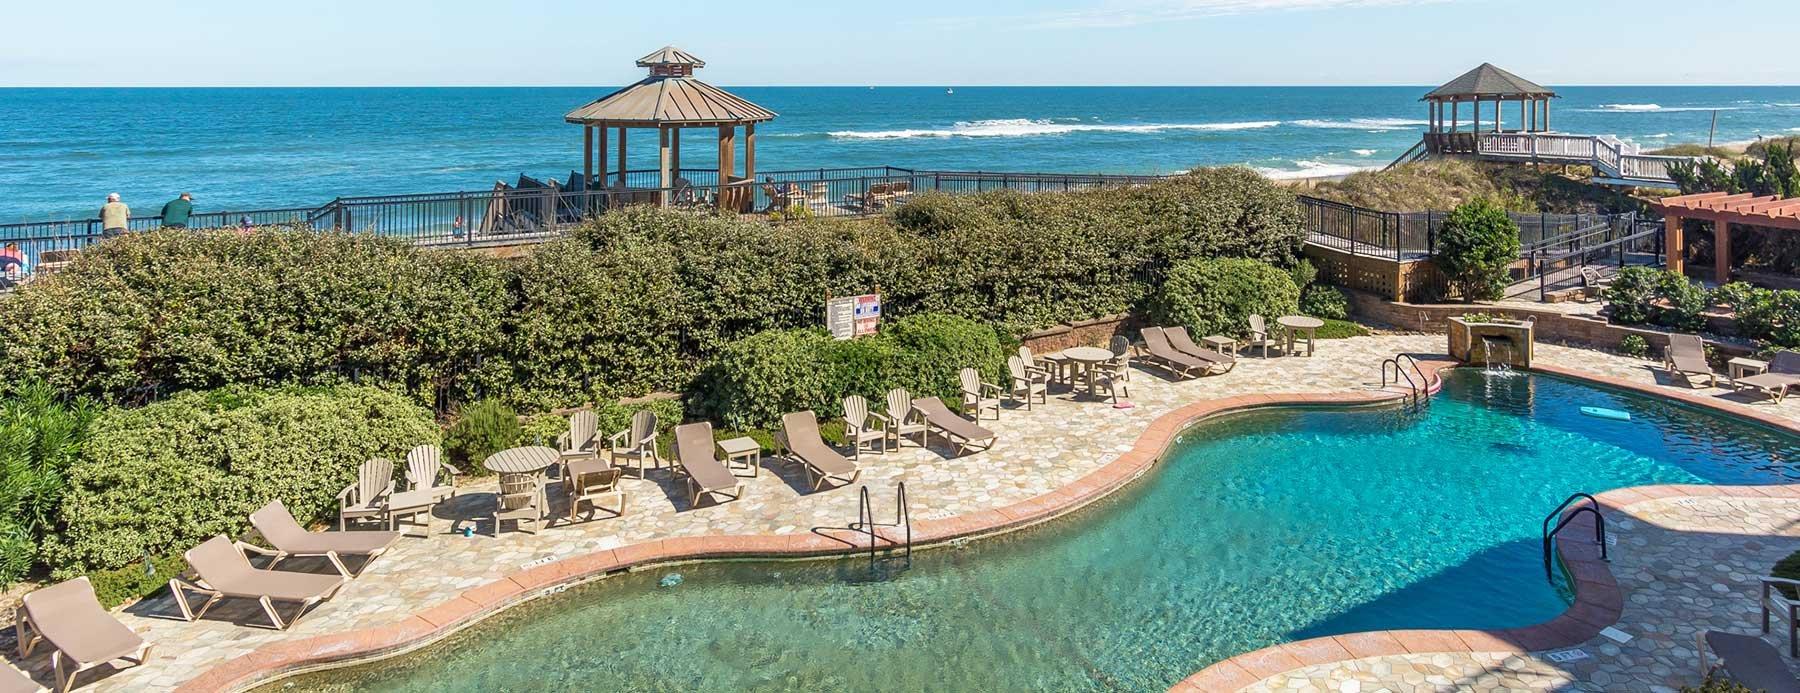 Outer Banks Vacation Rentals Real Estate Sales Village